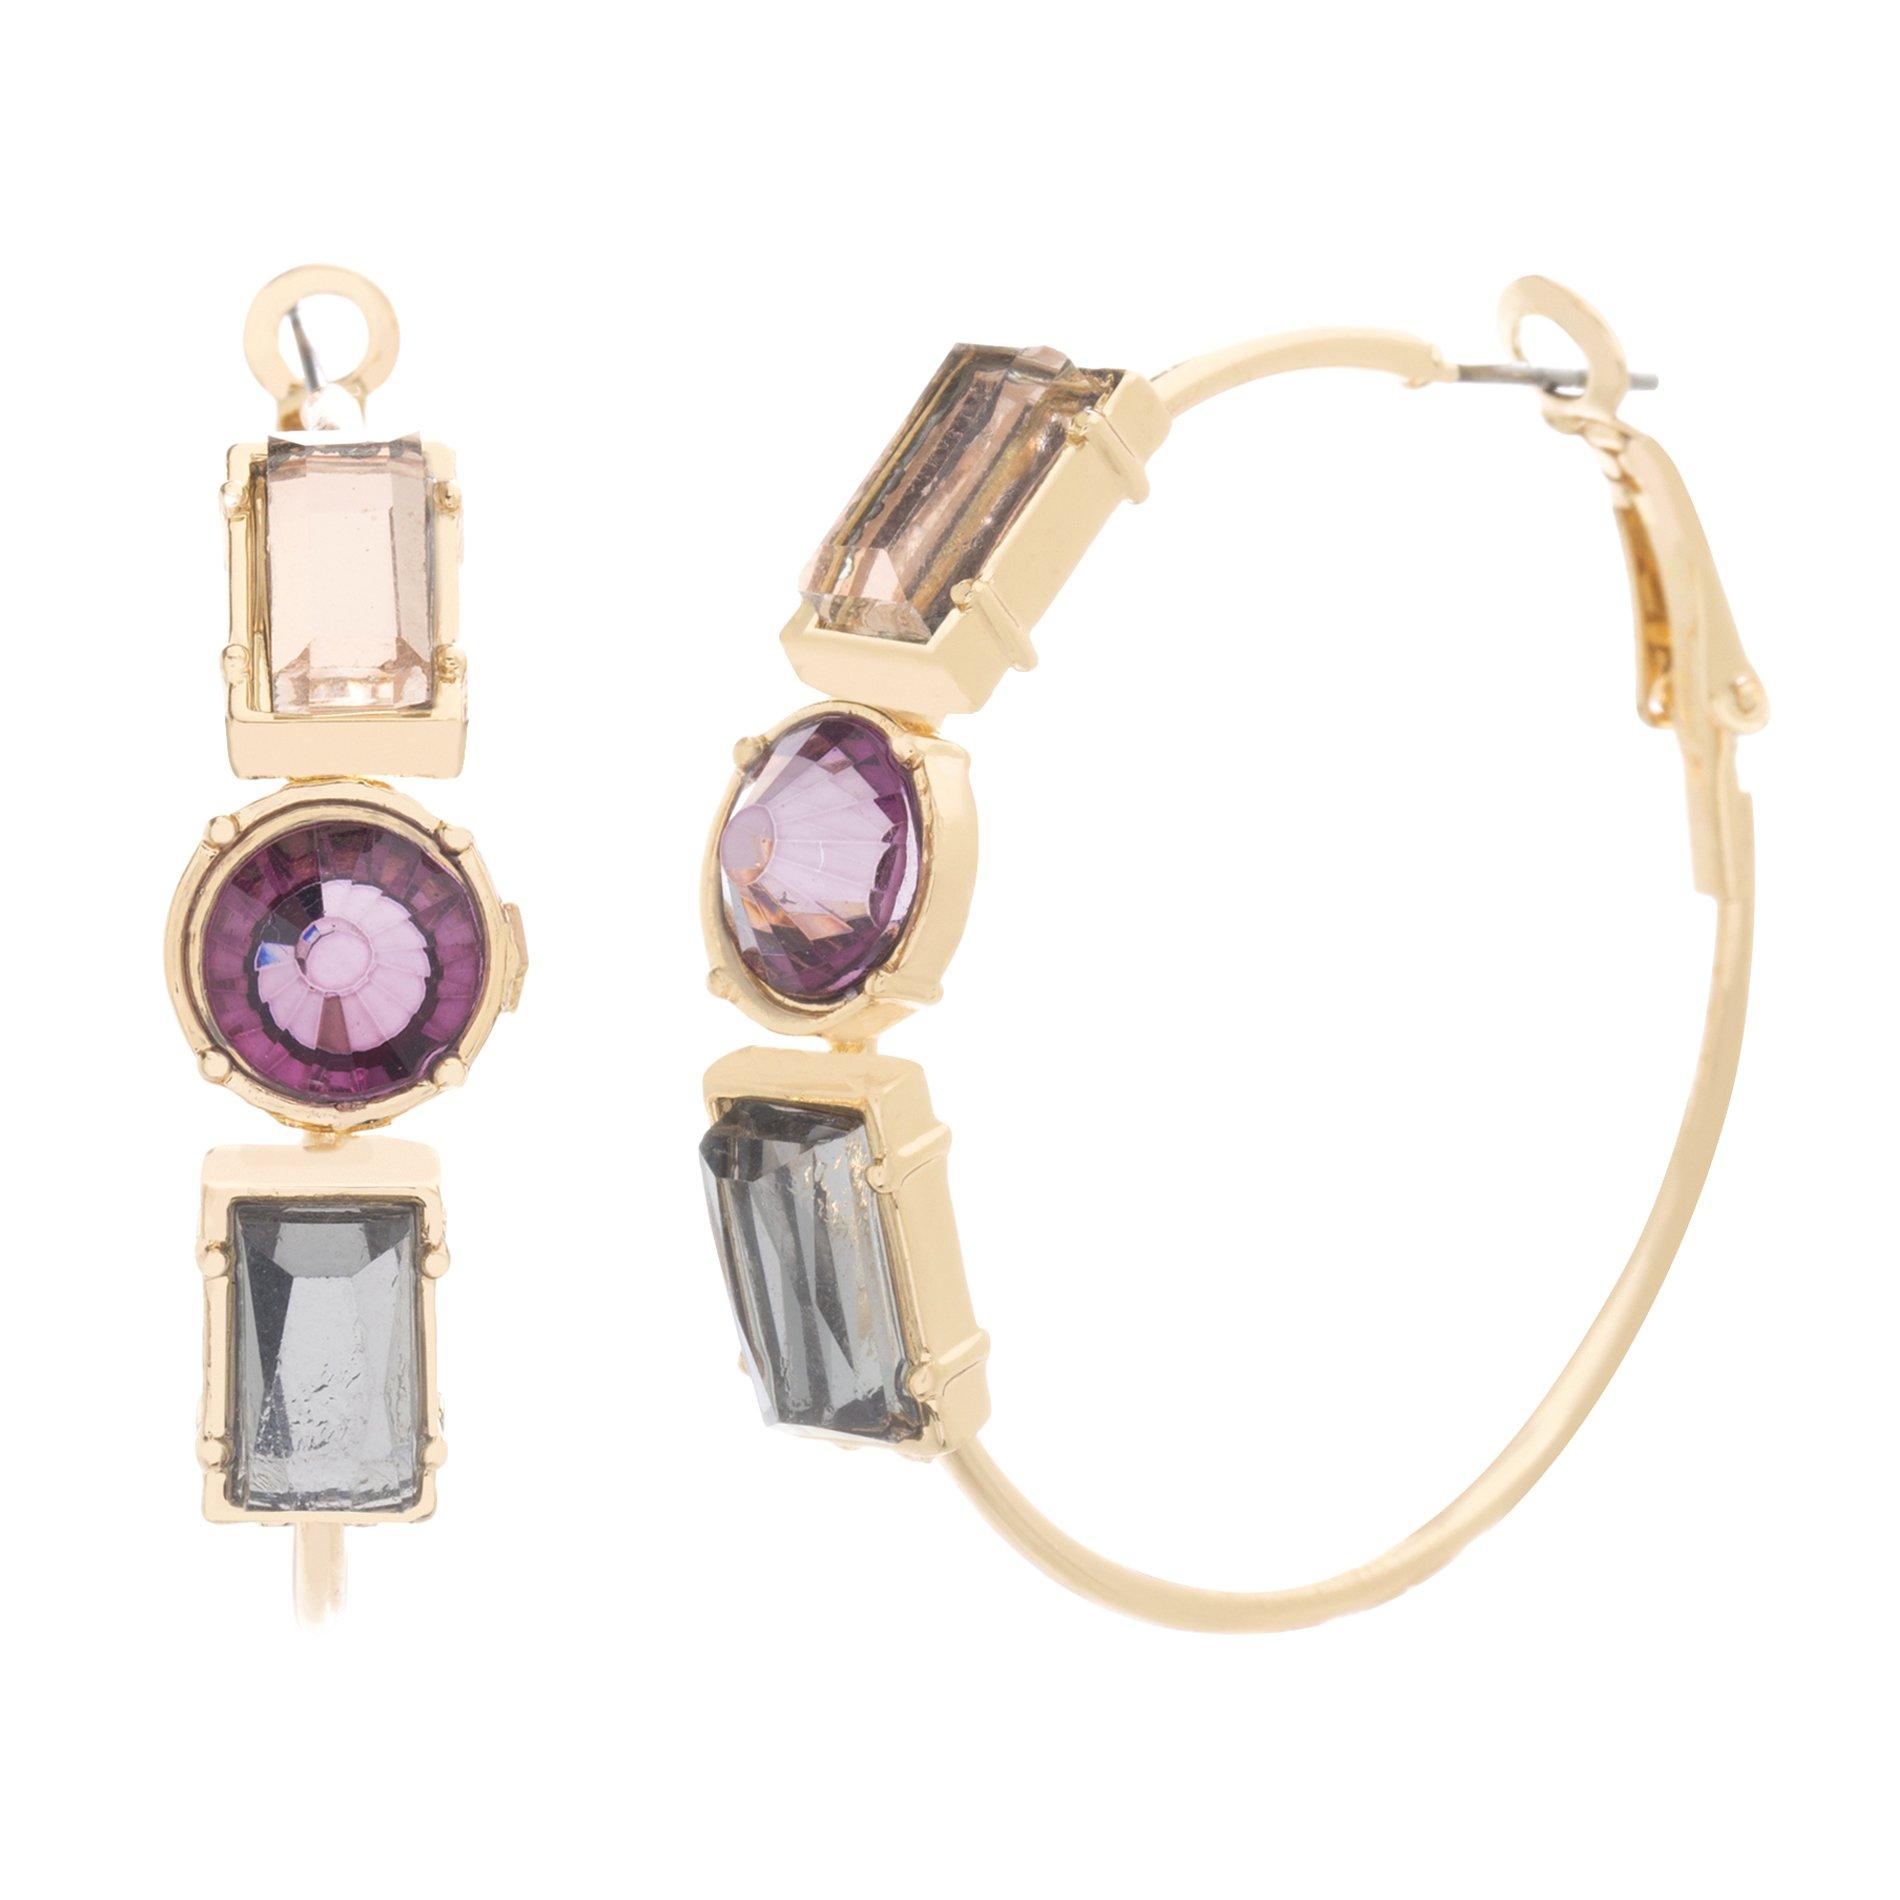 Catherine Malandrino Women's 44mm Multi-Tonal Stone Large Yellow Gold-Tone Hoop Earrings (Purple)